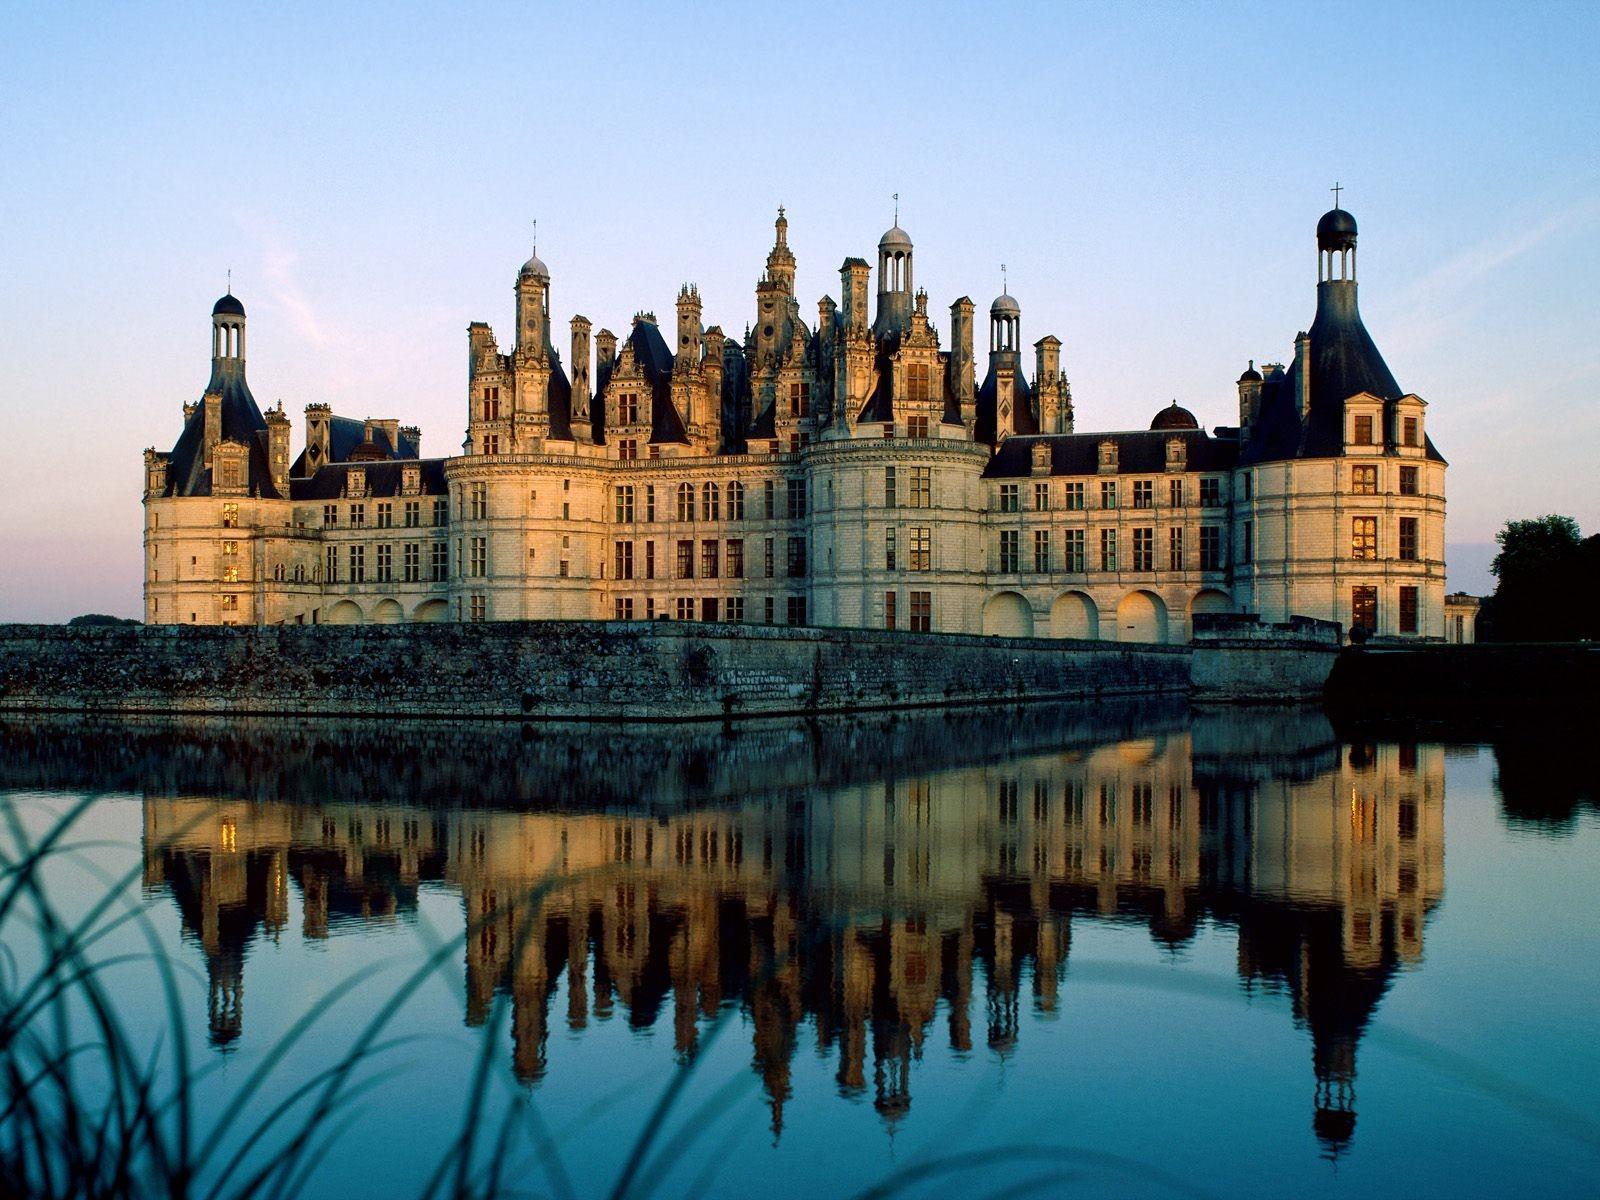 http://3.bp.blogspot.com/-9zip8GYhVGo/UBdvJ7iyDWI/AAAAAAAABdg/i0W_IPVgrPg/s1600/Beautiful+Chateau+Desktop+Wallpaper.jpg